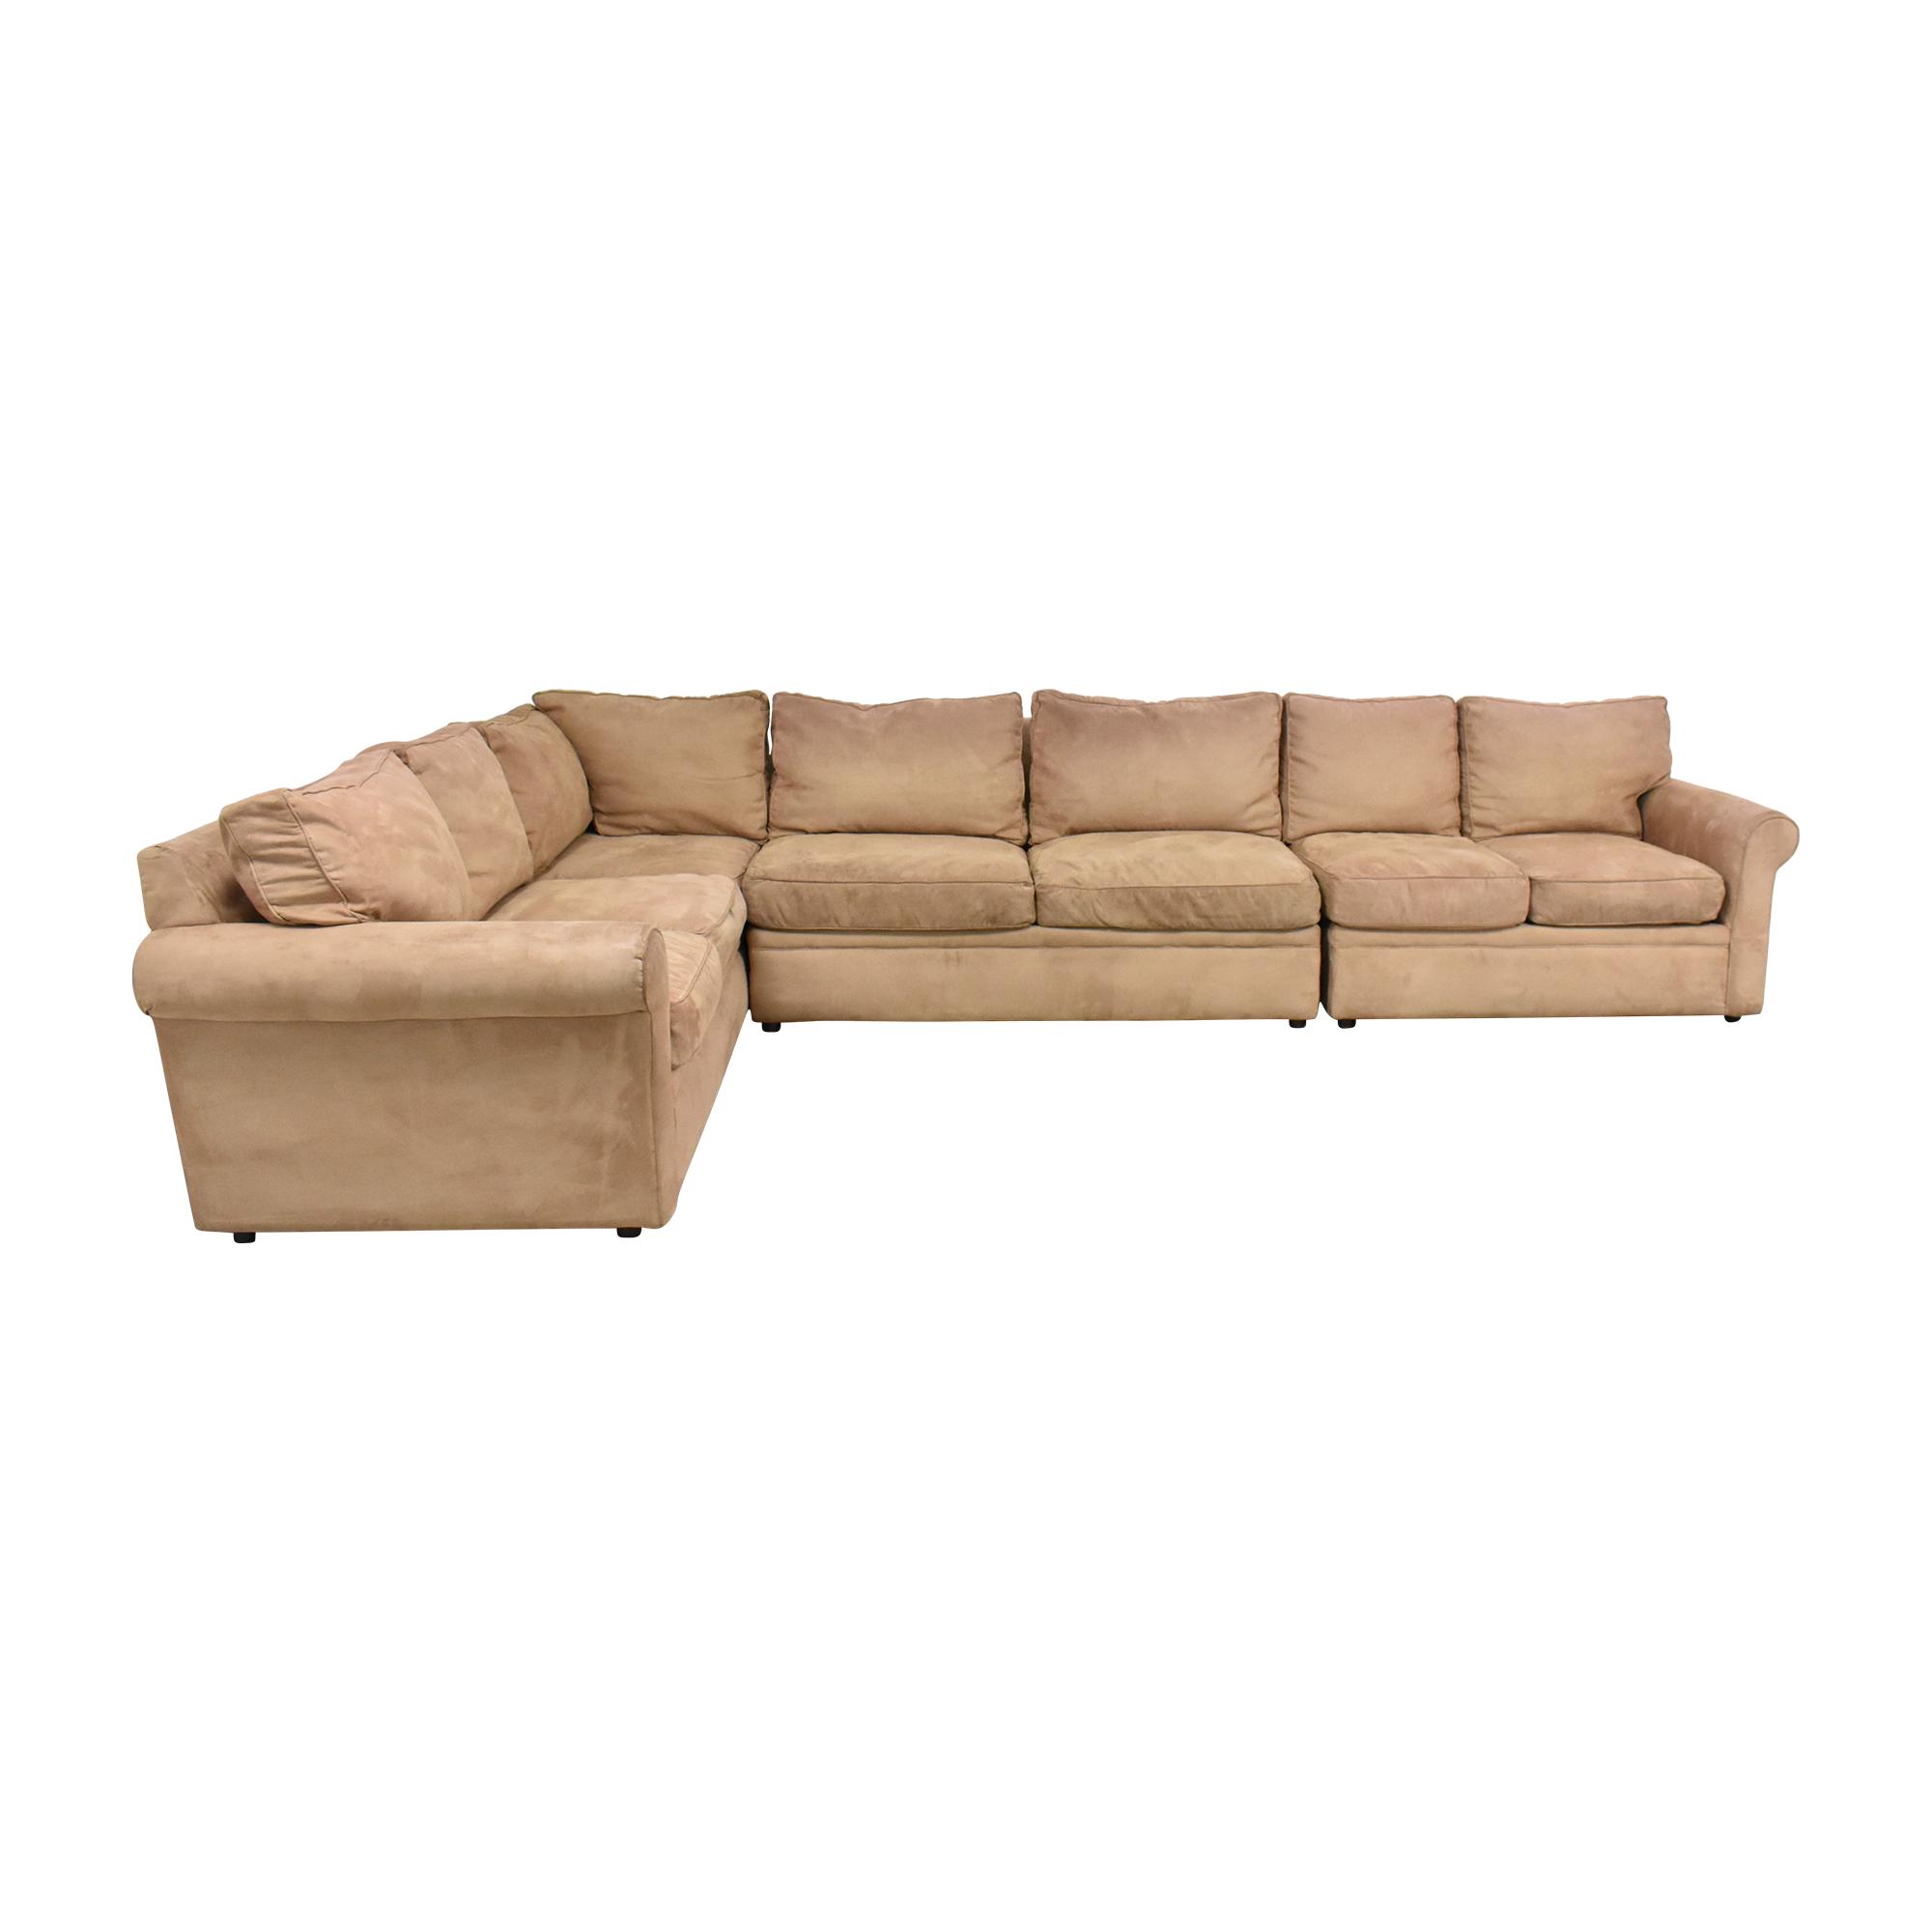 buy Rowe Furniture Corner Sectional Sofa Rowe Furniture Sectionals